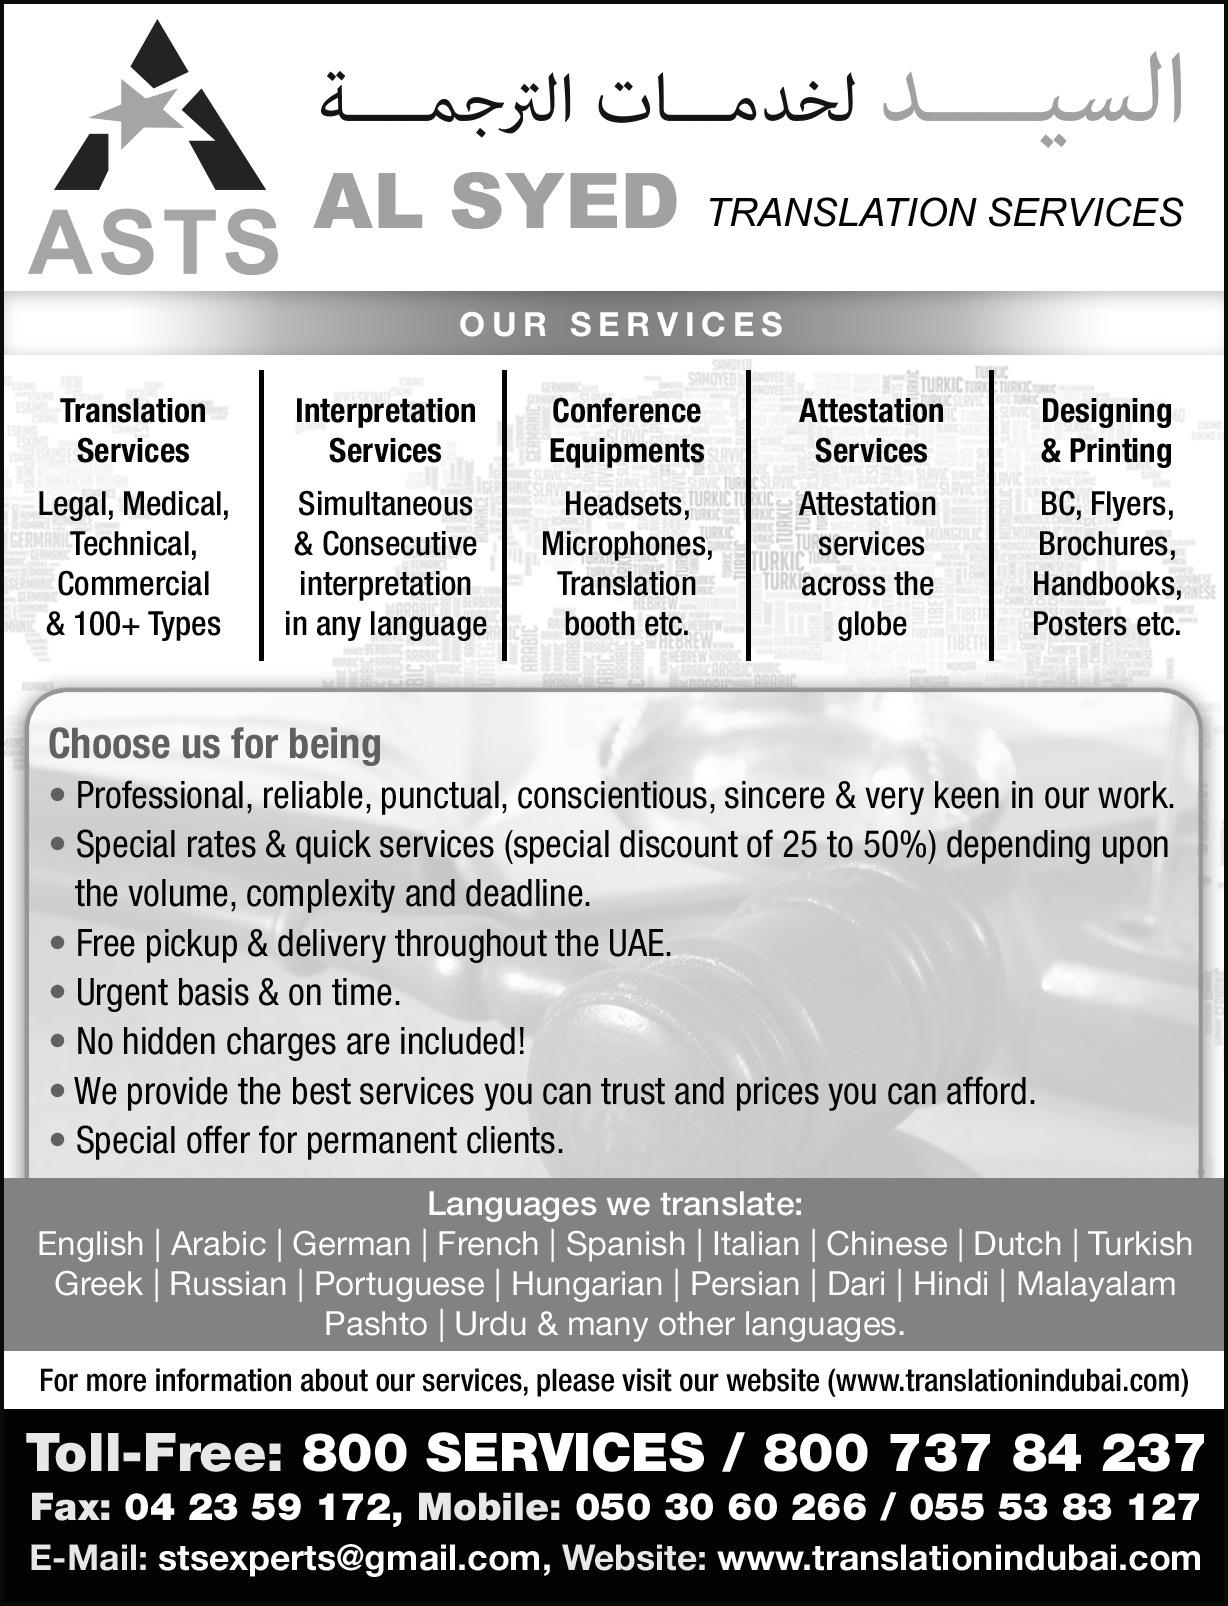 AL SYED TRANSLATION 44V